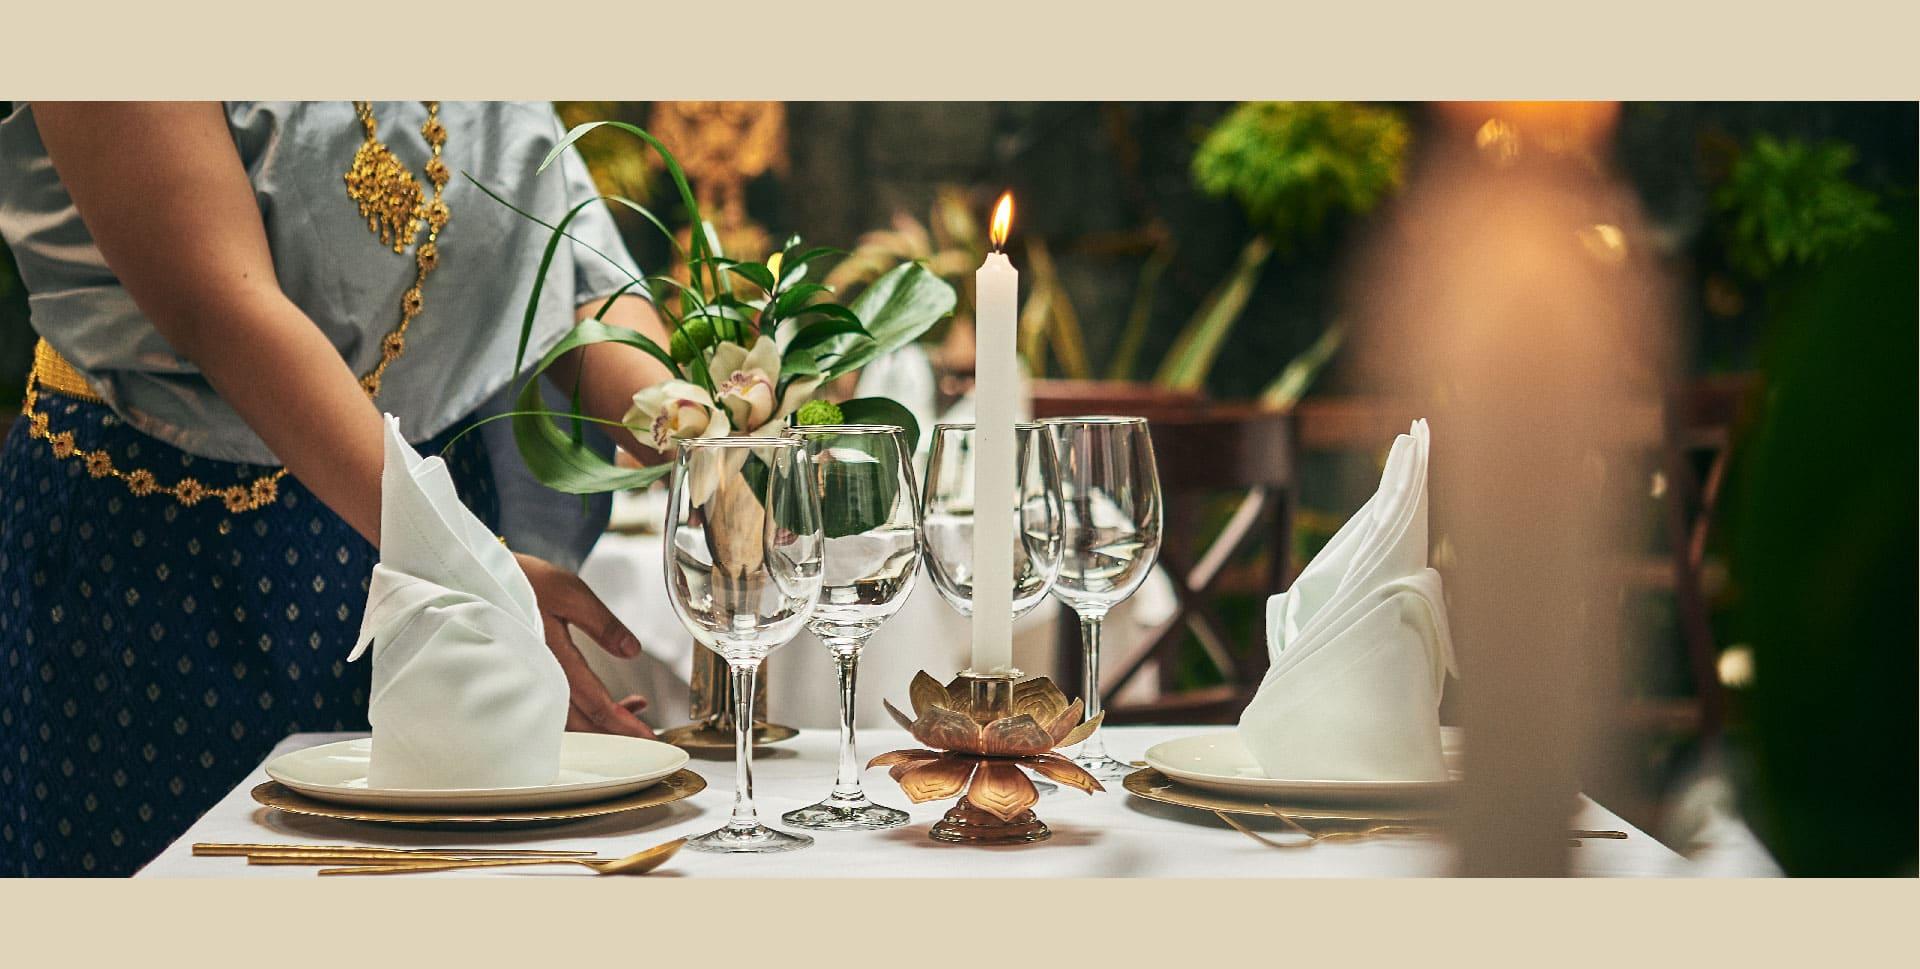 the-restaurant-cocina-thai